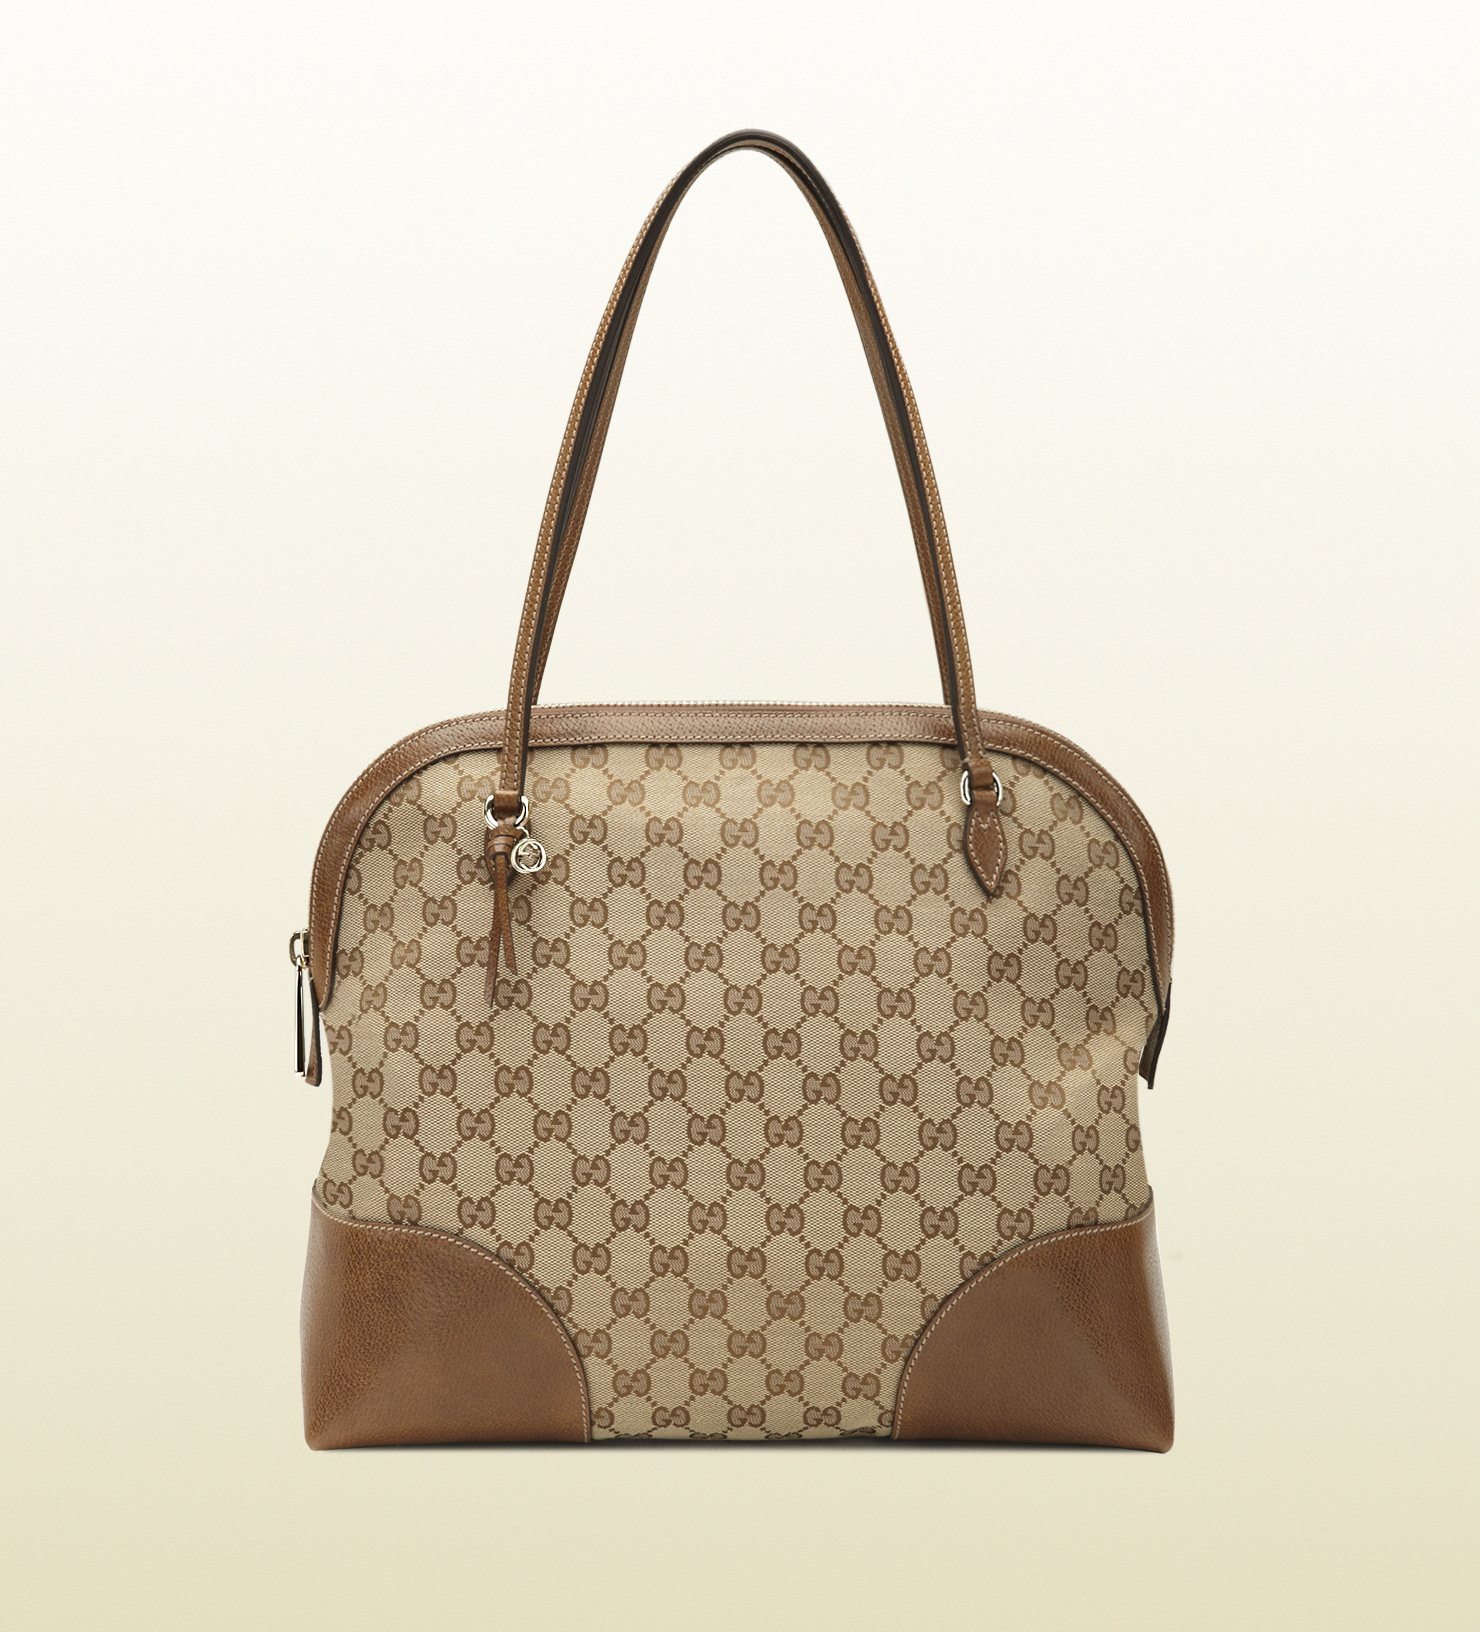 775b73f7153fd0 Gucci Bree Original Gg Canvas Shoulder Bag in Brown - Lyst